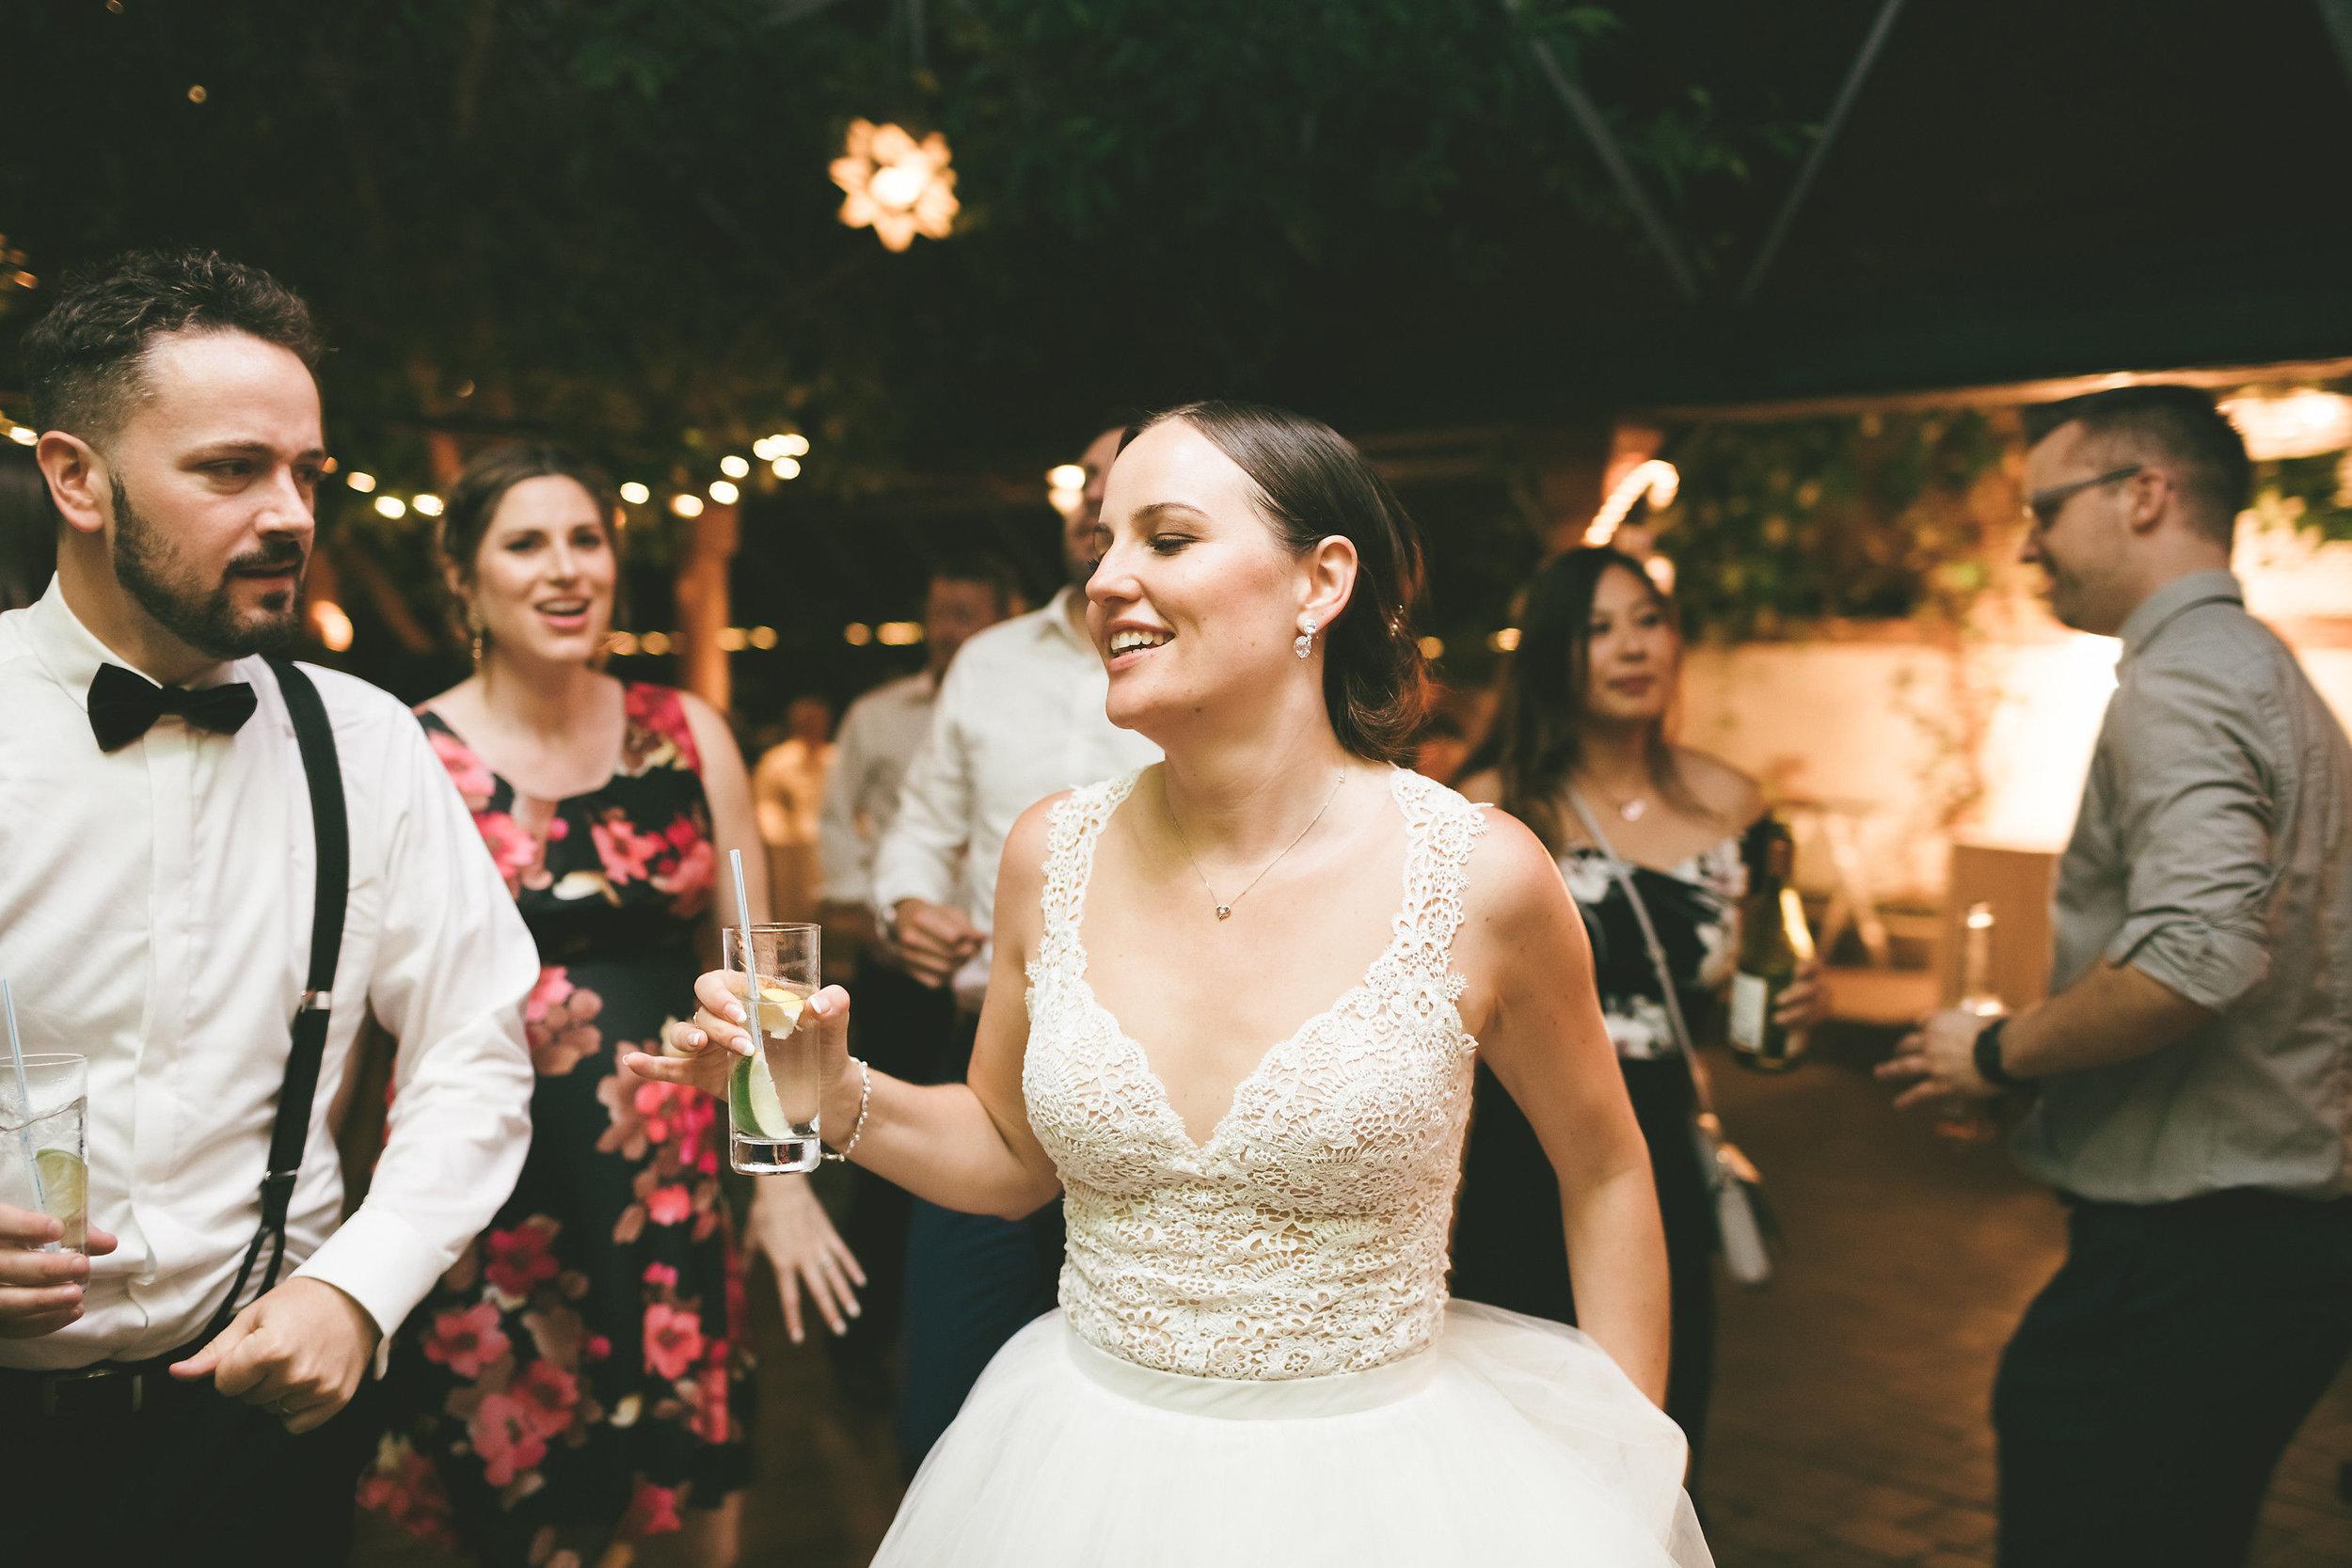 gosia___mike_wedding___lifesreel_danielcaruso___1727.jpg